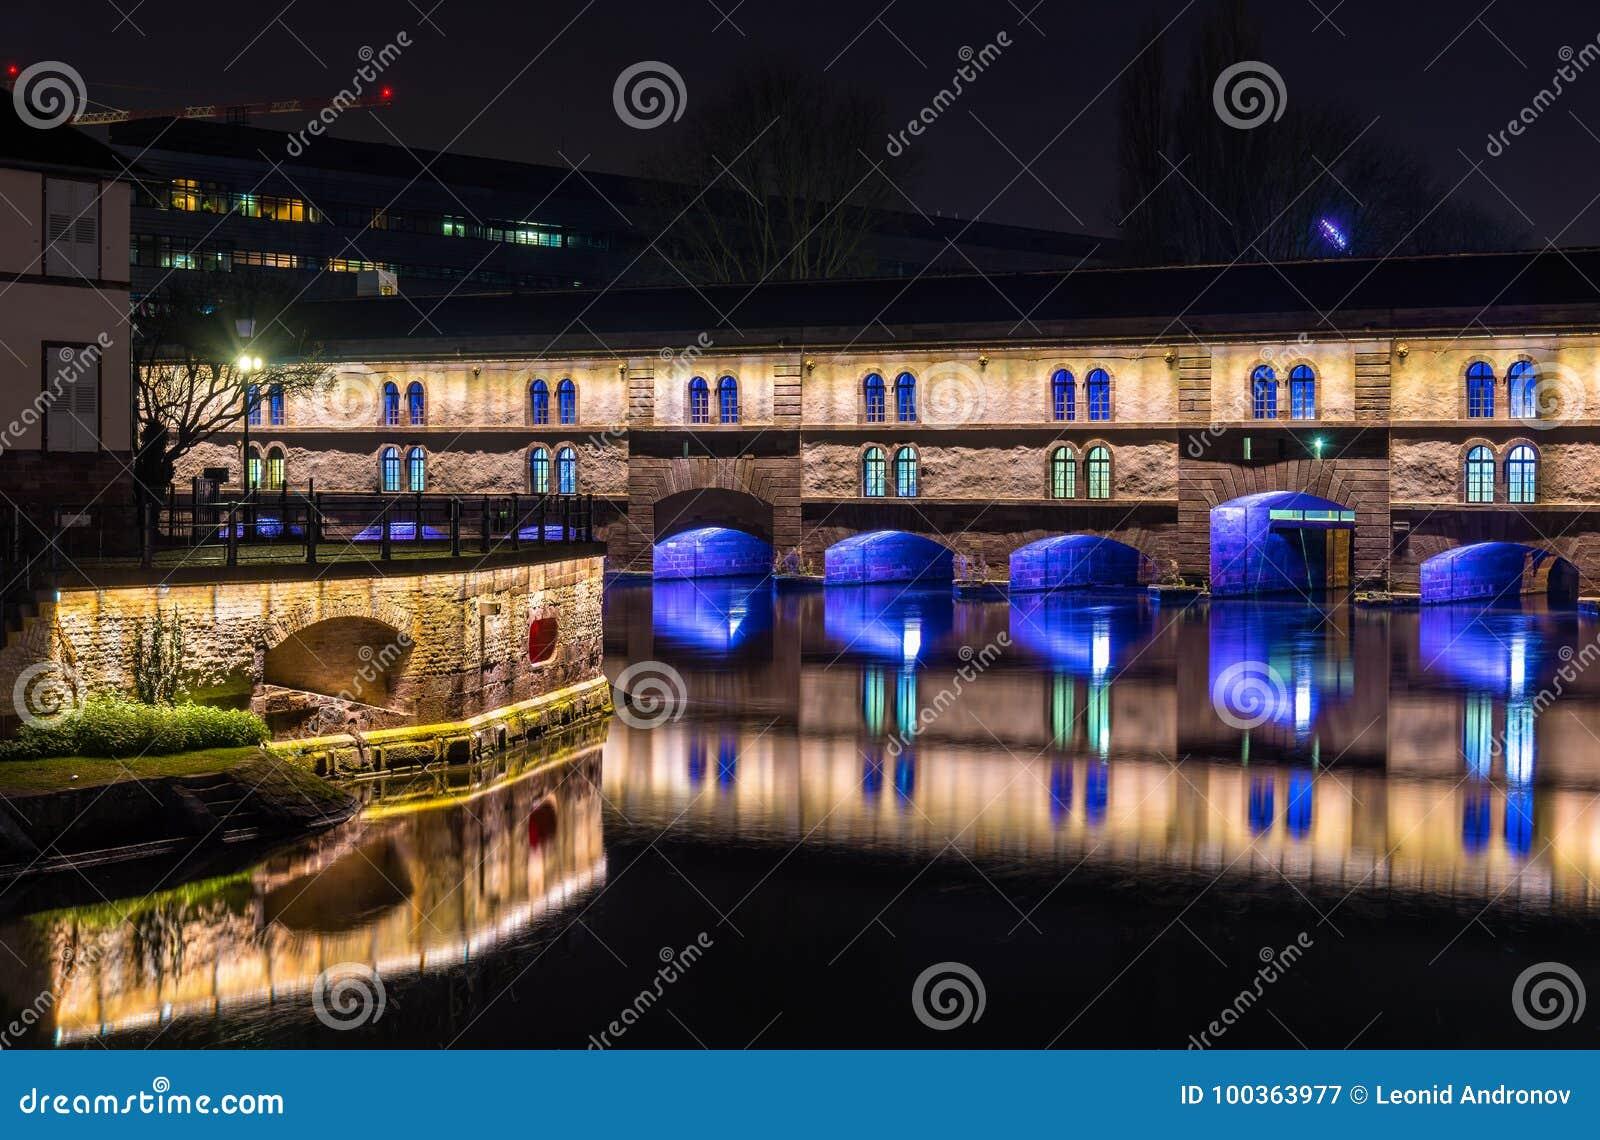 Night illumination of Barrage Vauban in Strasbourg, France